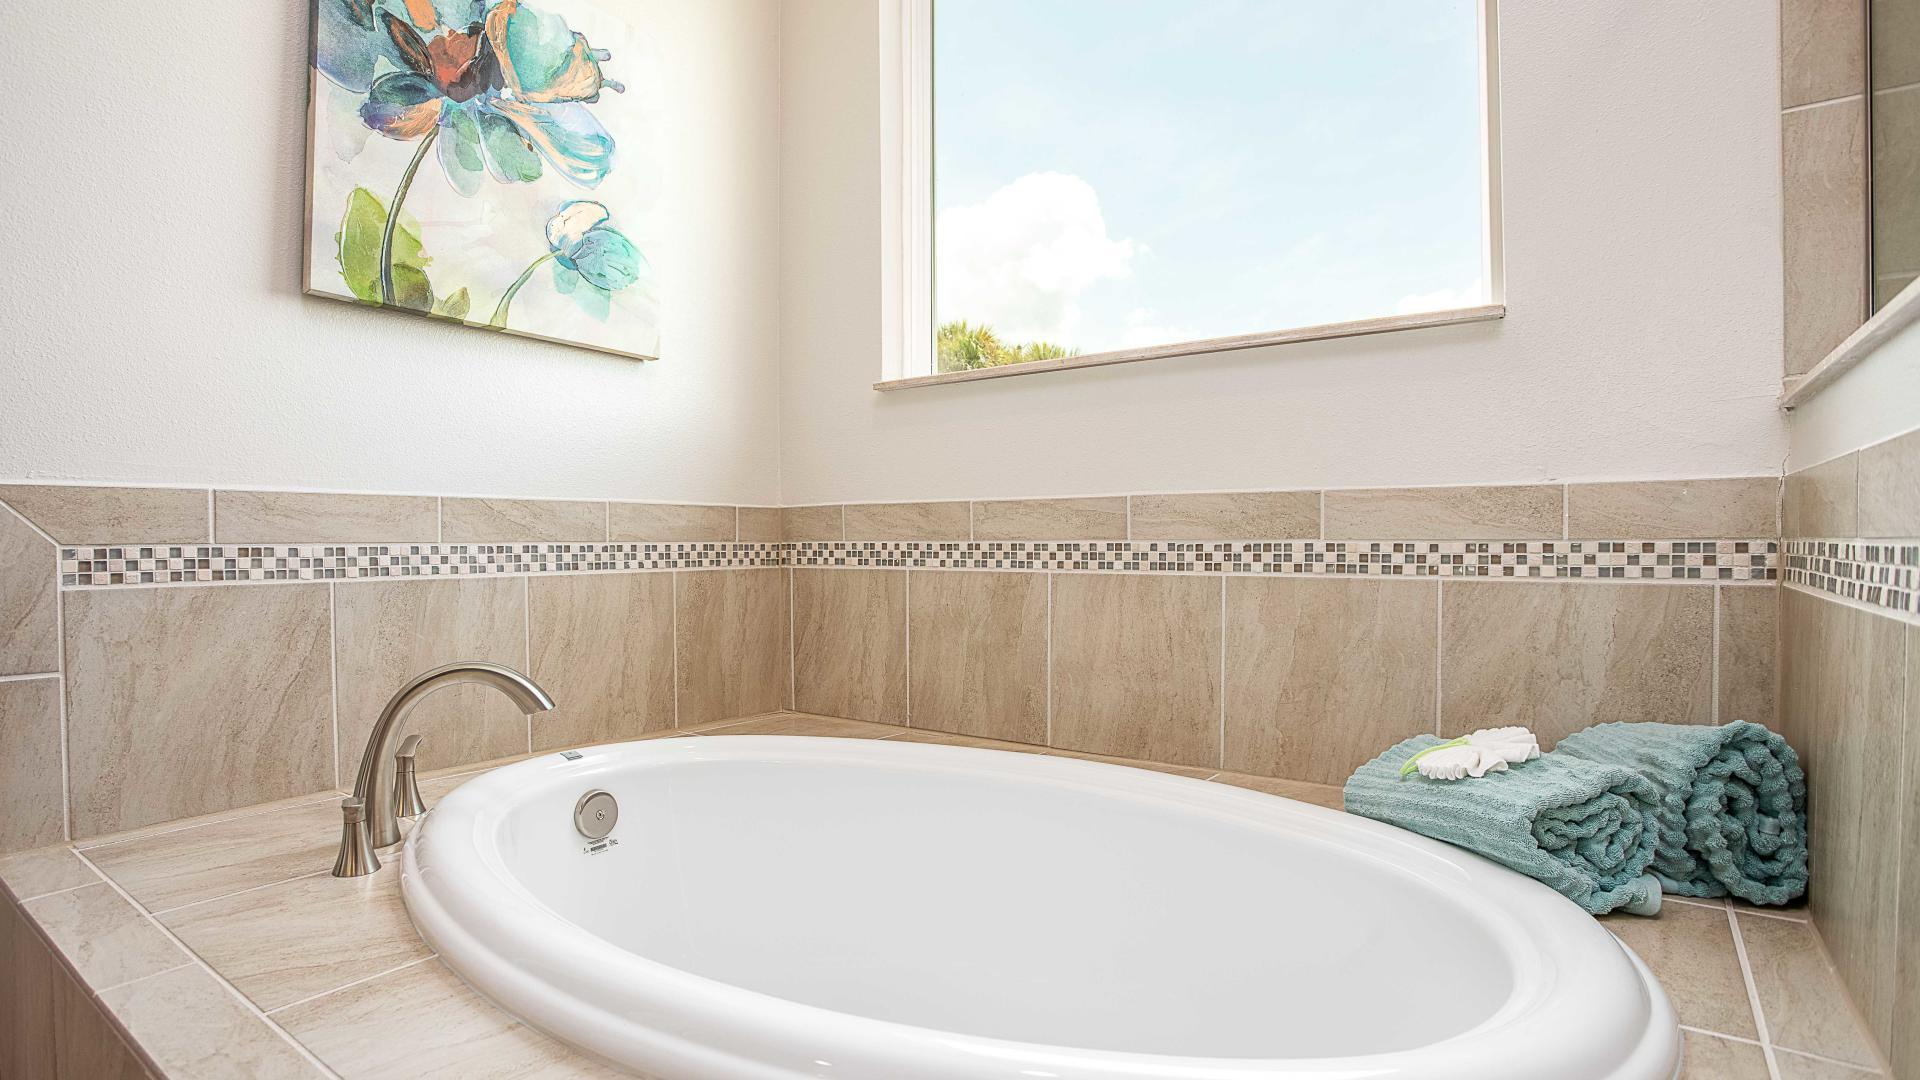 Bathroom featured in the Sienna By Maronda Homes in Daytona Beach, FL